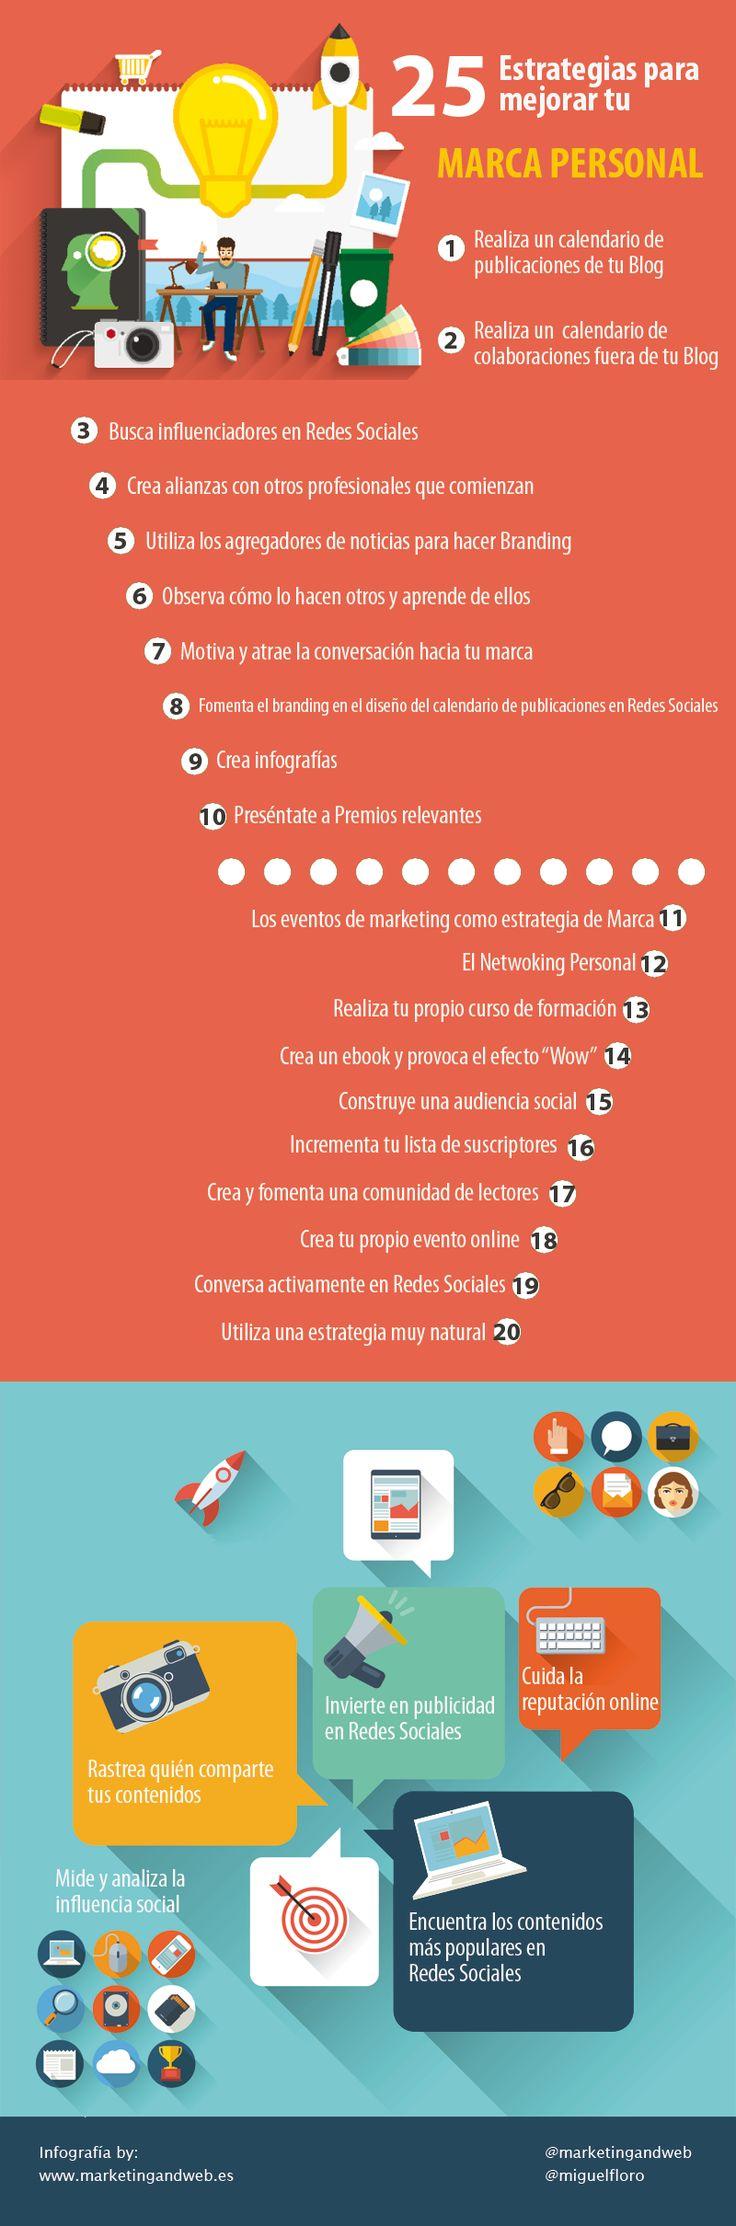 25 Estrategias para impulsar tu Marca Personal #infografia #infographic #marketing